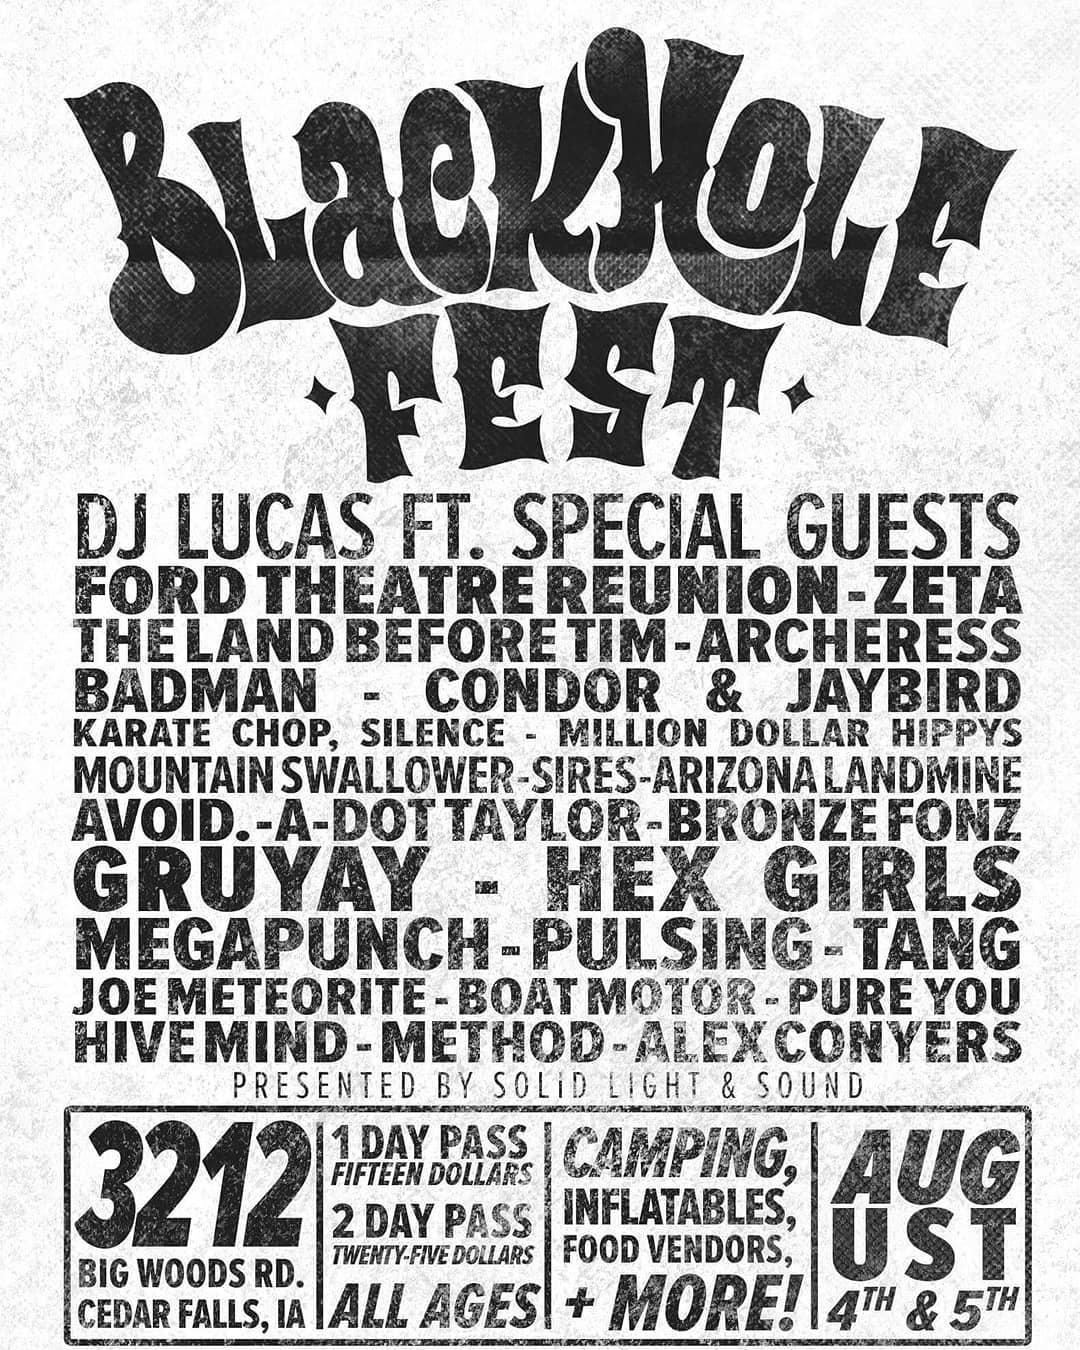 Black Hole Fest Flyer